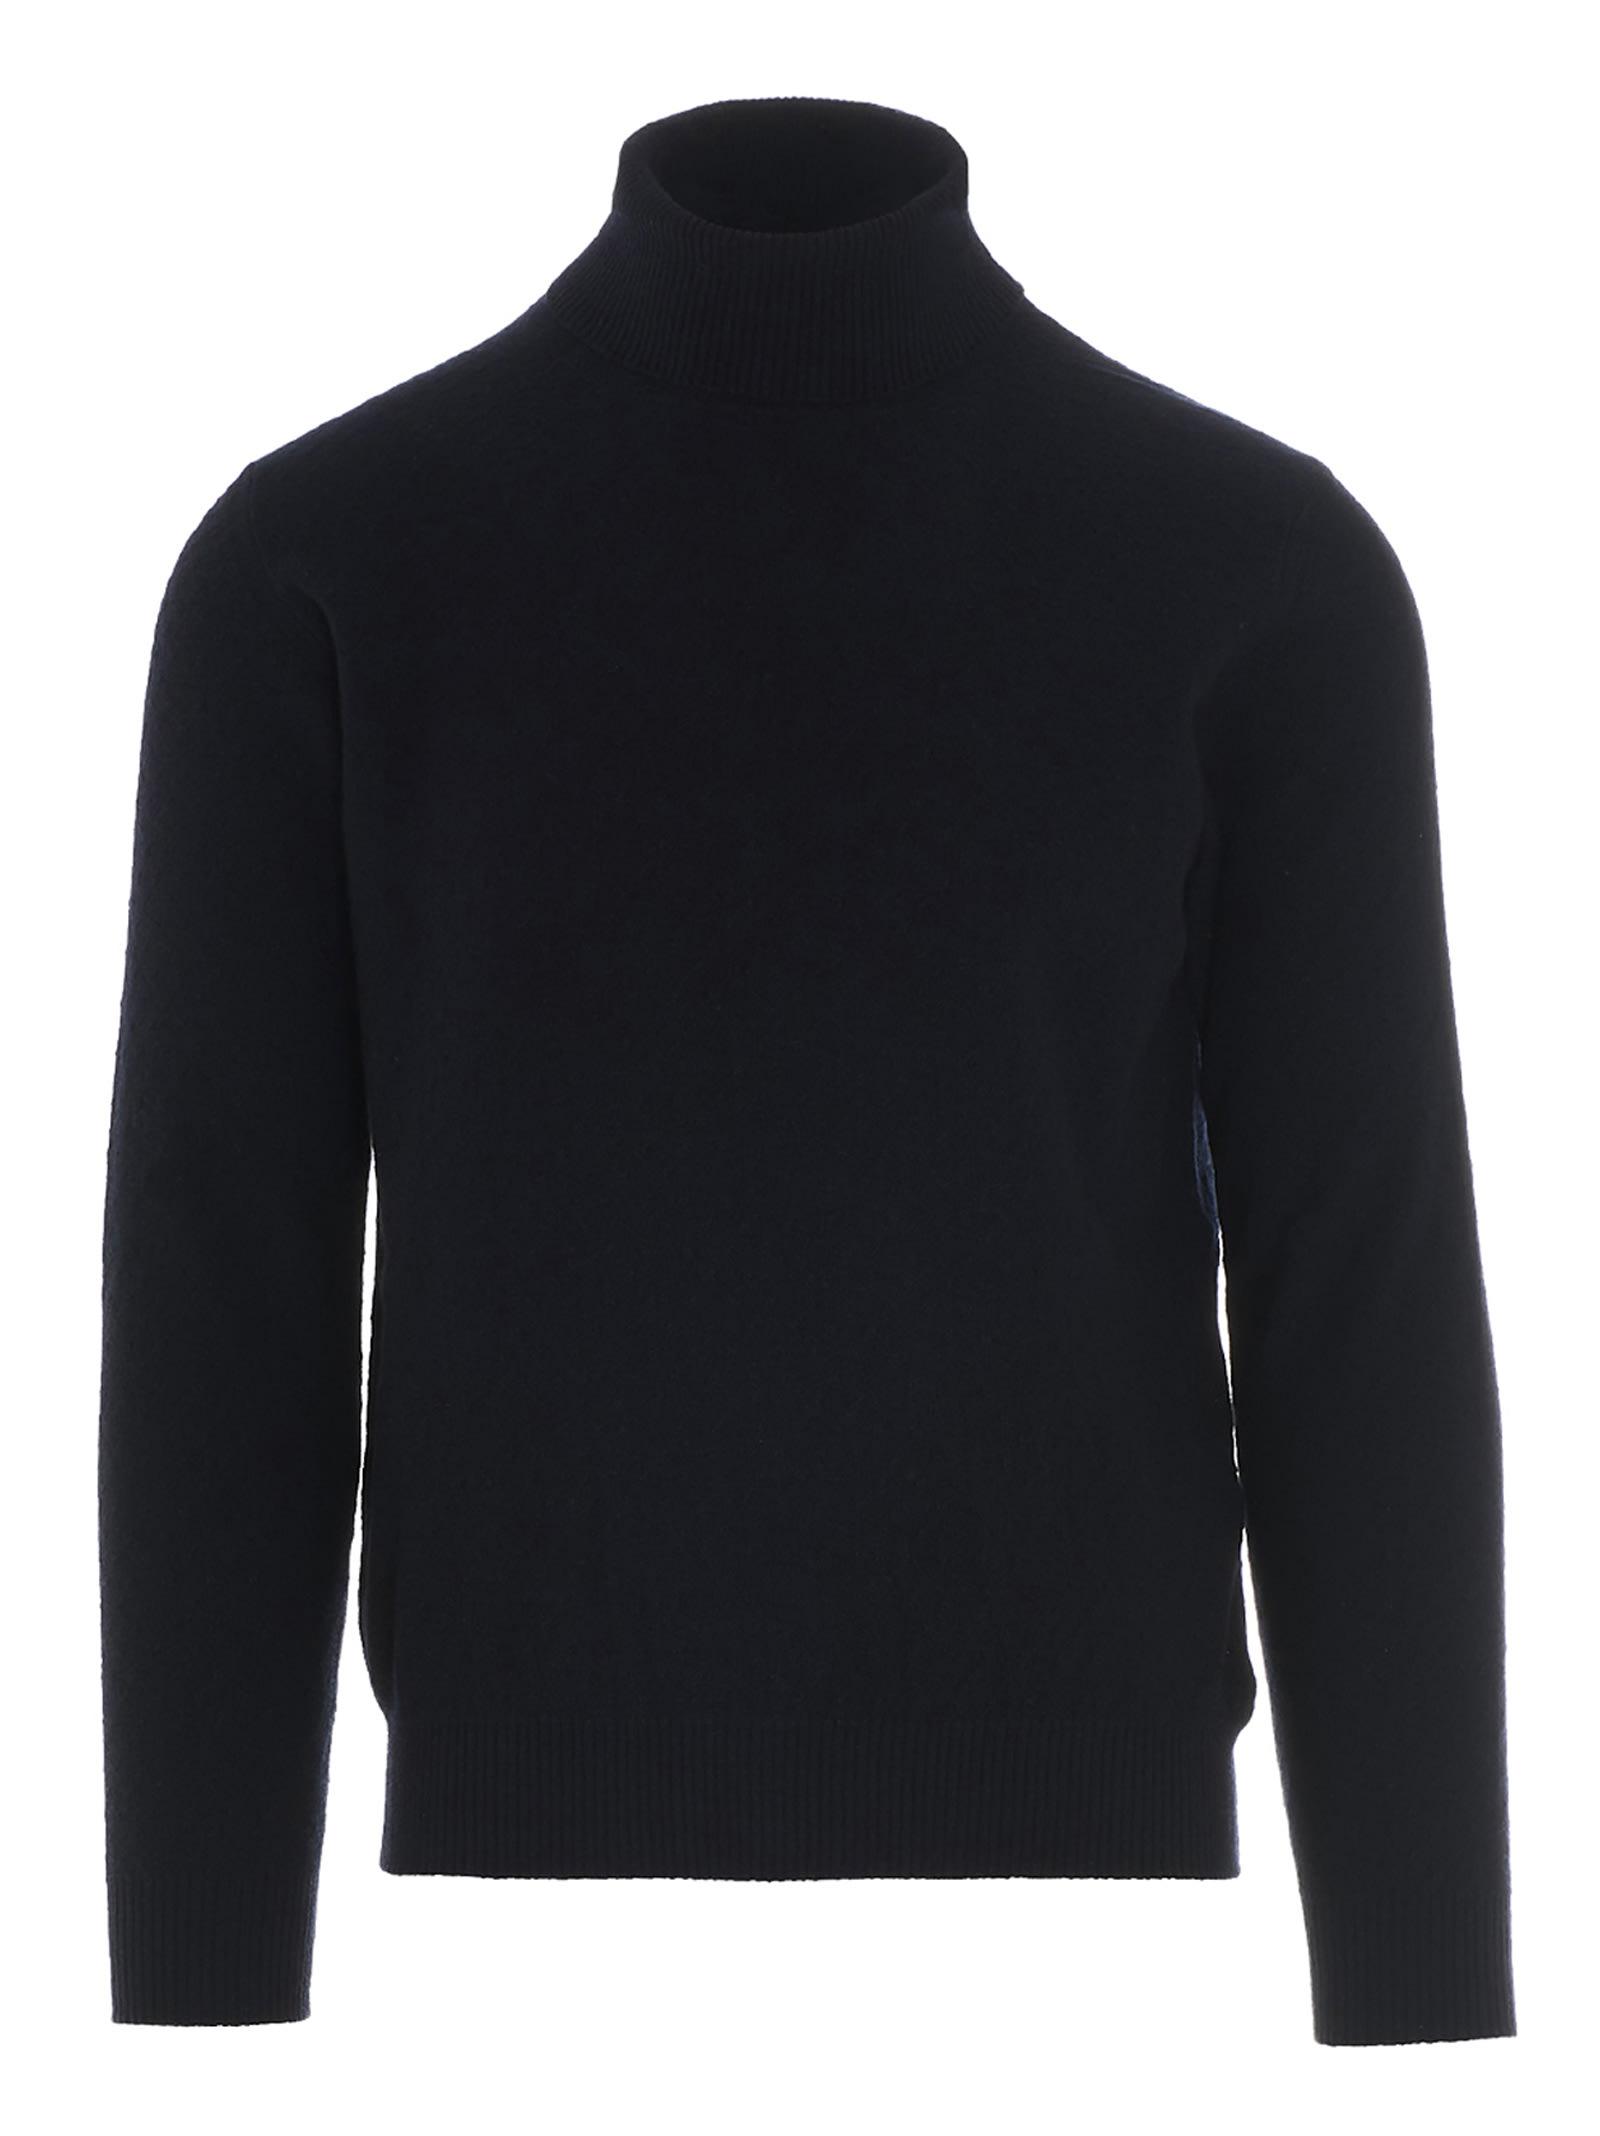 1901 Sweater